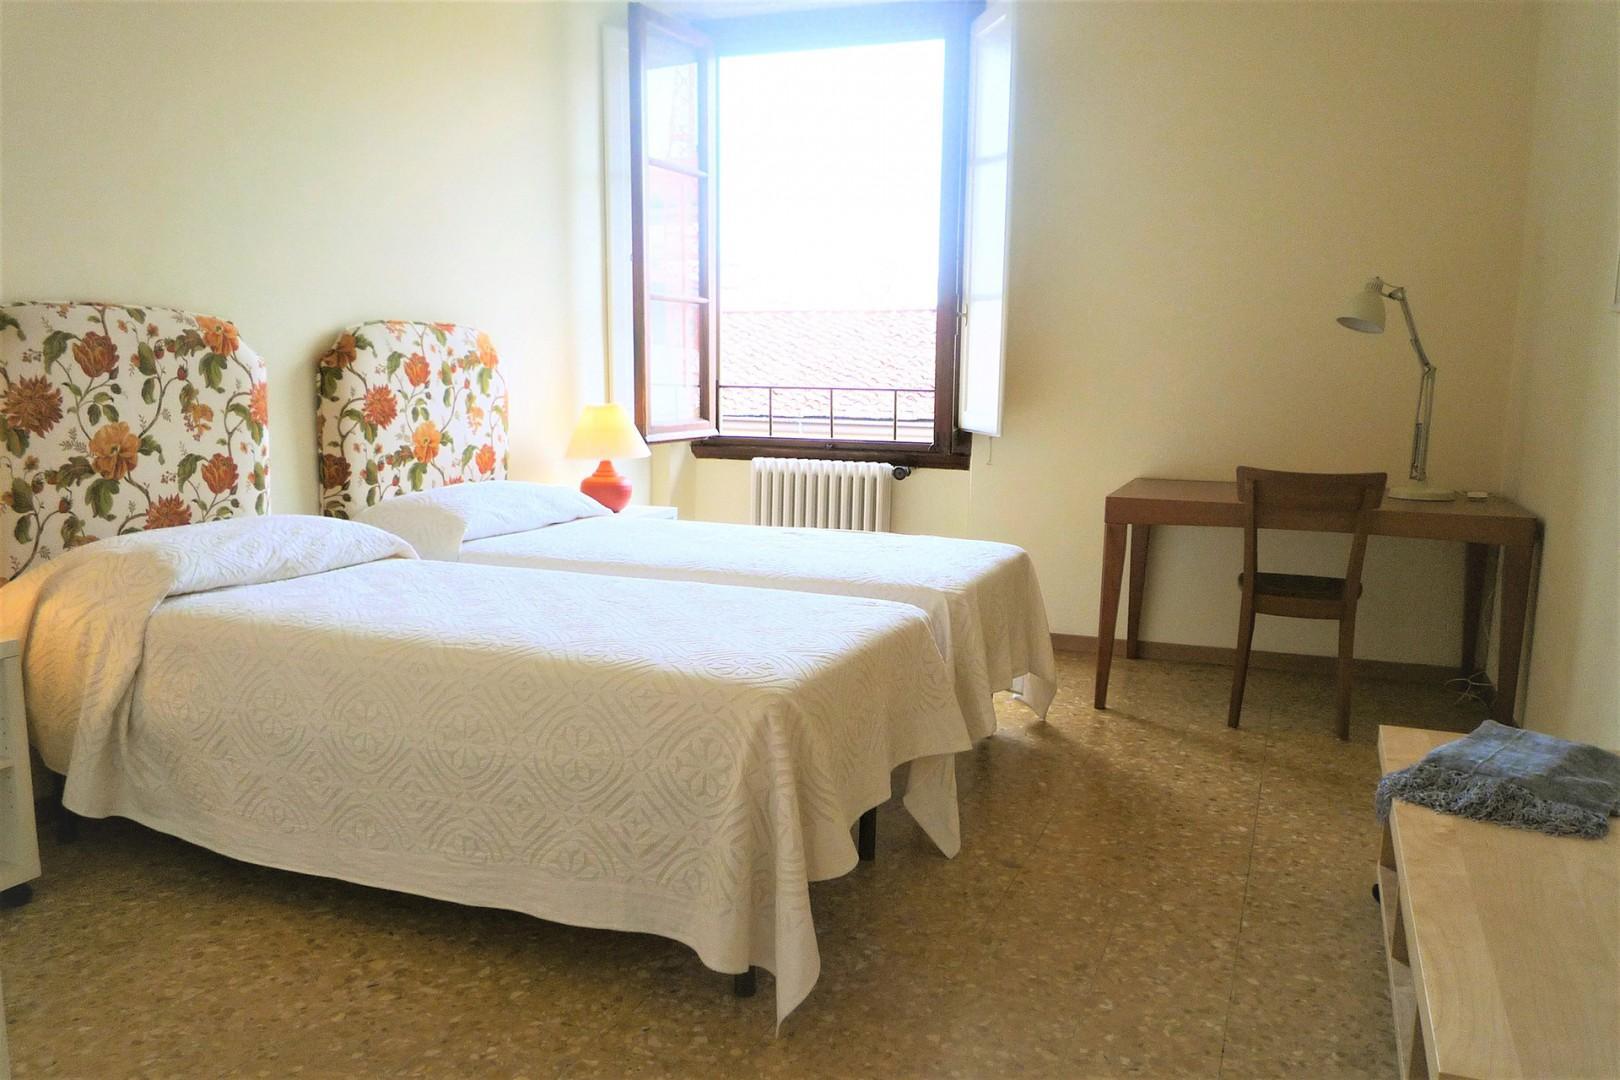 Bedroom 2 has two beds. The window overlooks the street.